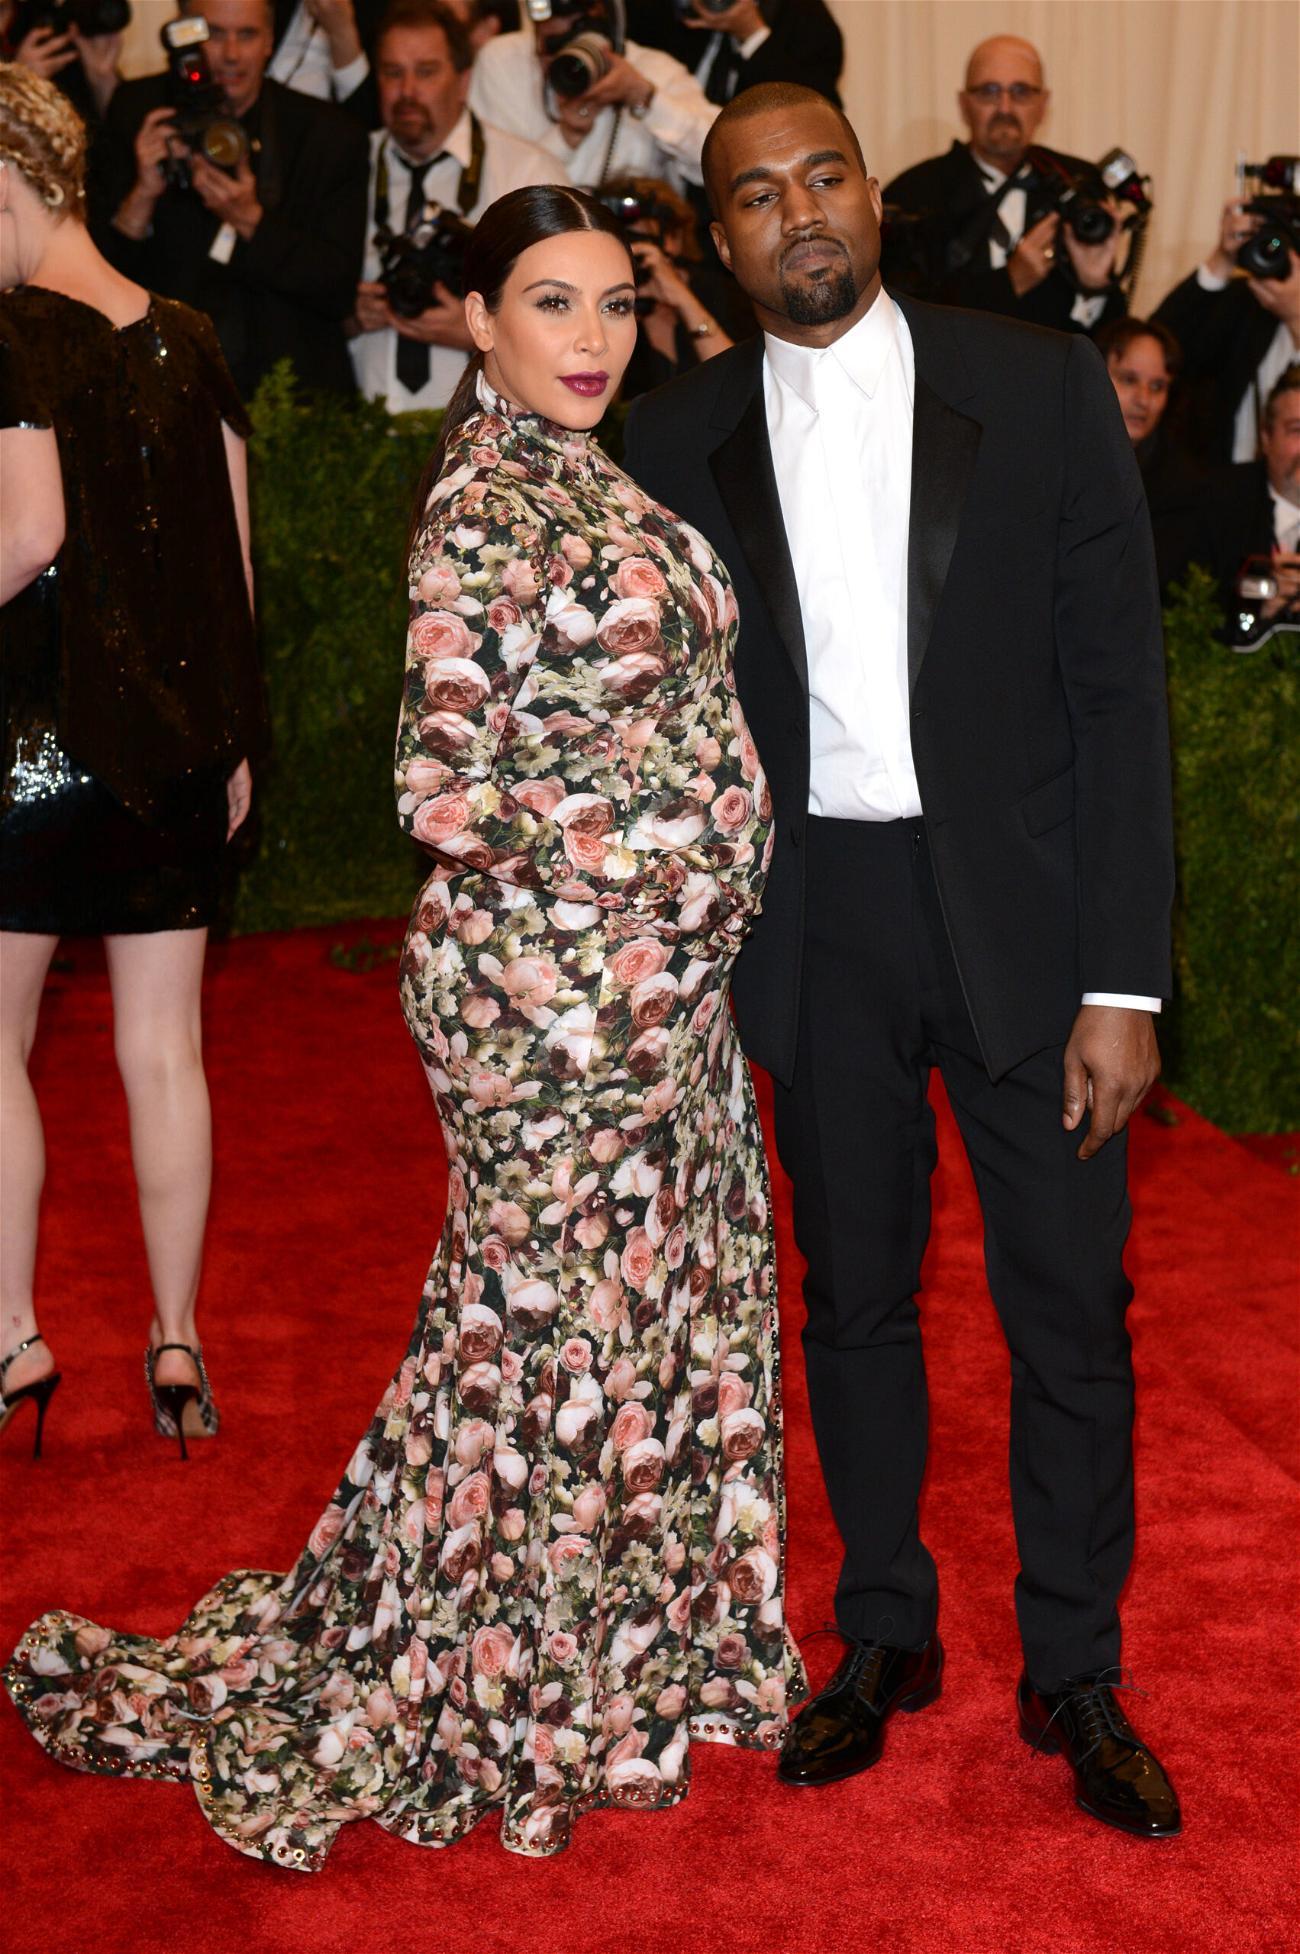 Kanye West Raps His Marital Home With Kim Kardashian Was 'Jail?!'